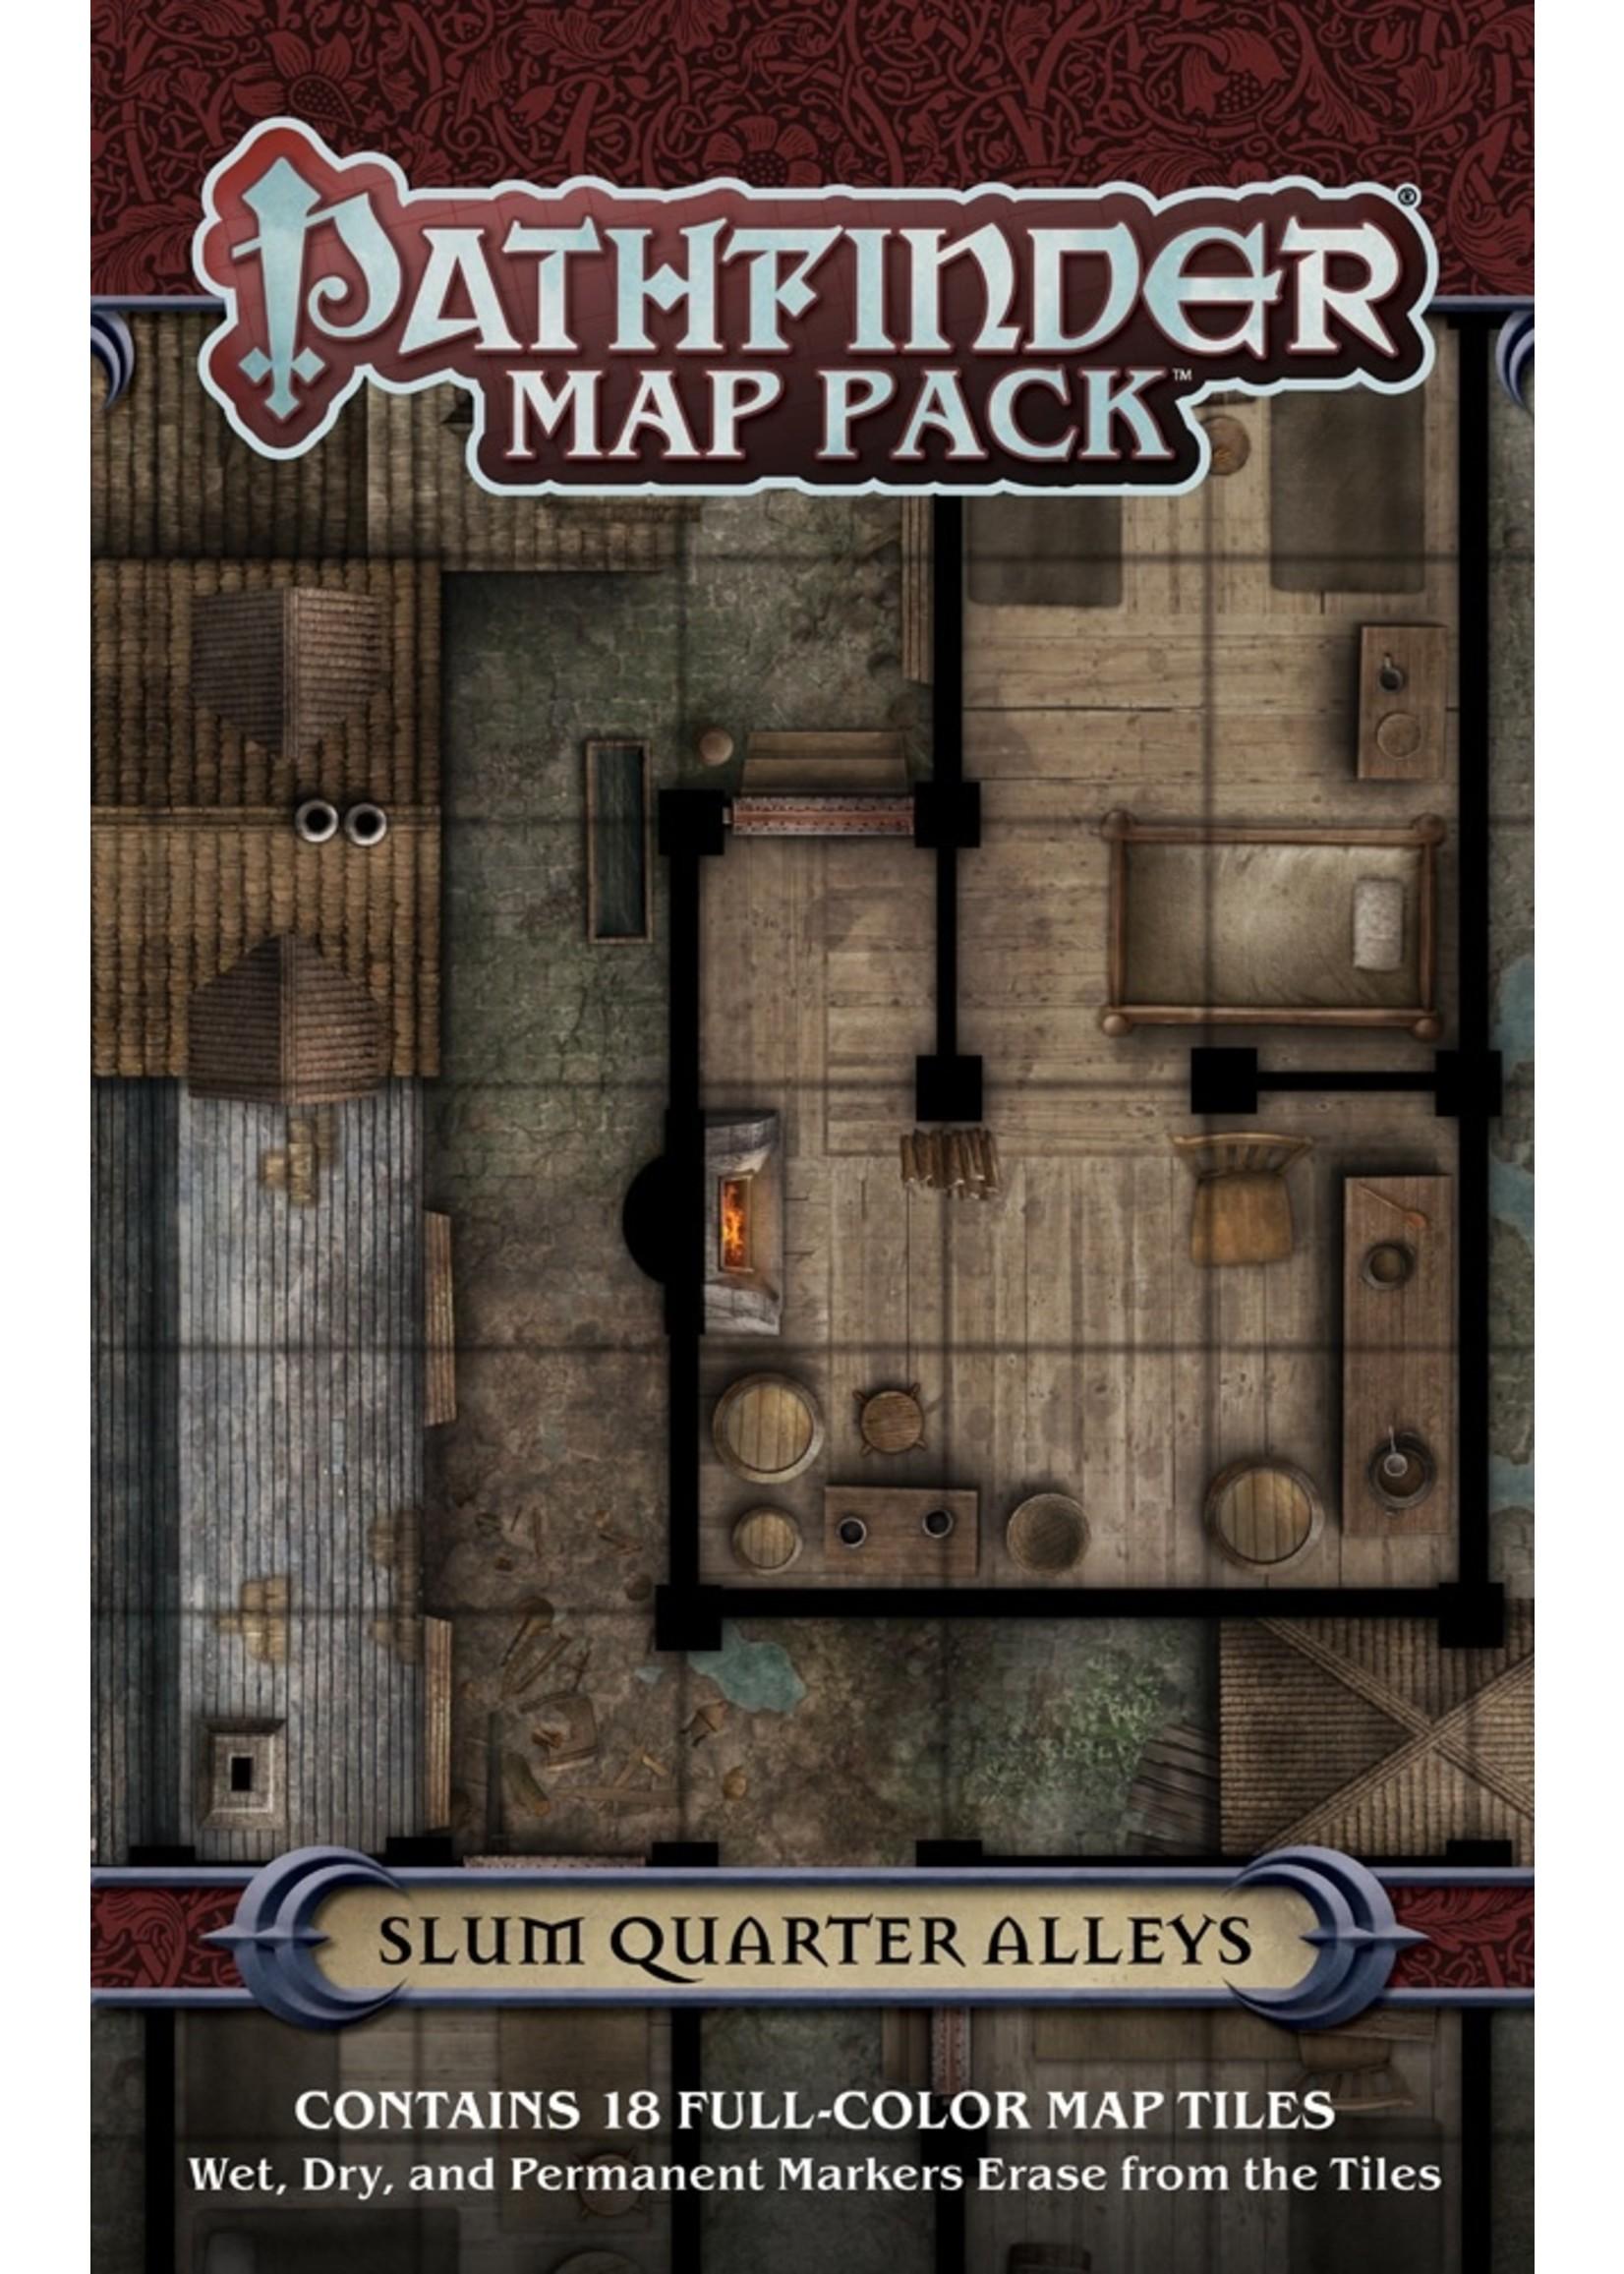 Pathfinder RPG: Map Pack - Slum Quarter Alleys